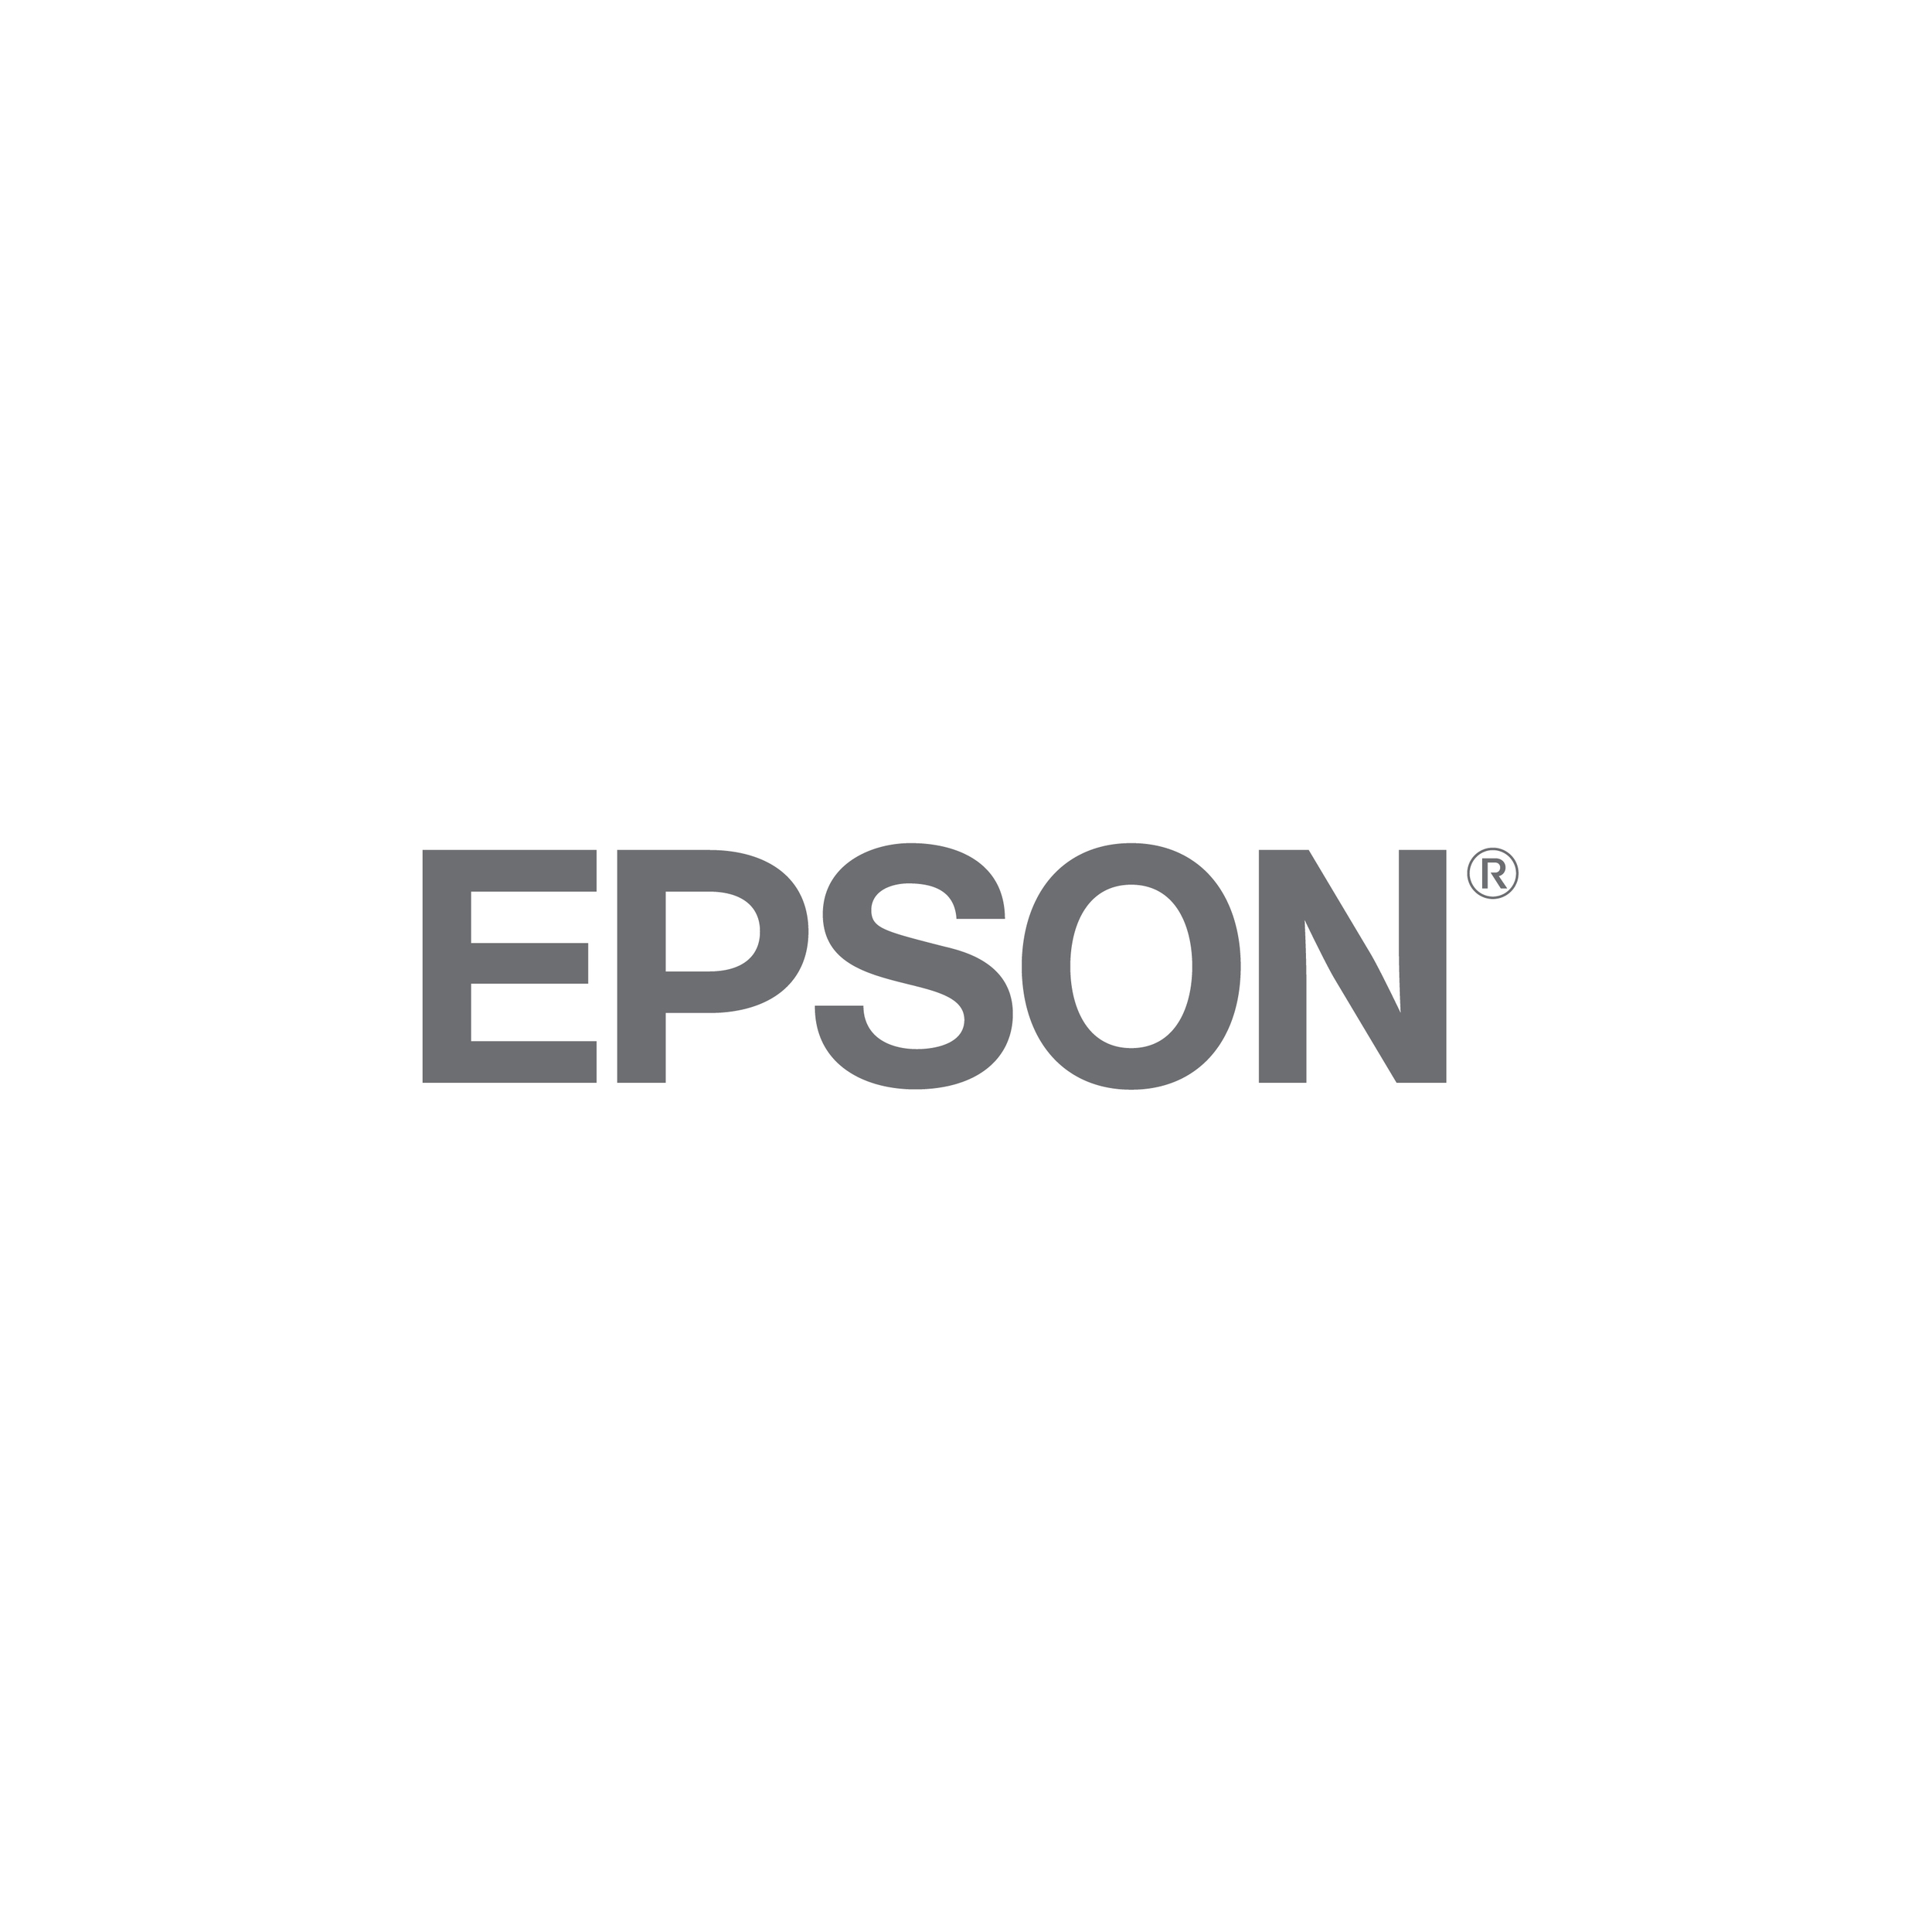 Logo-09-Epson.jpg